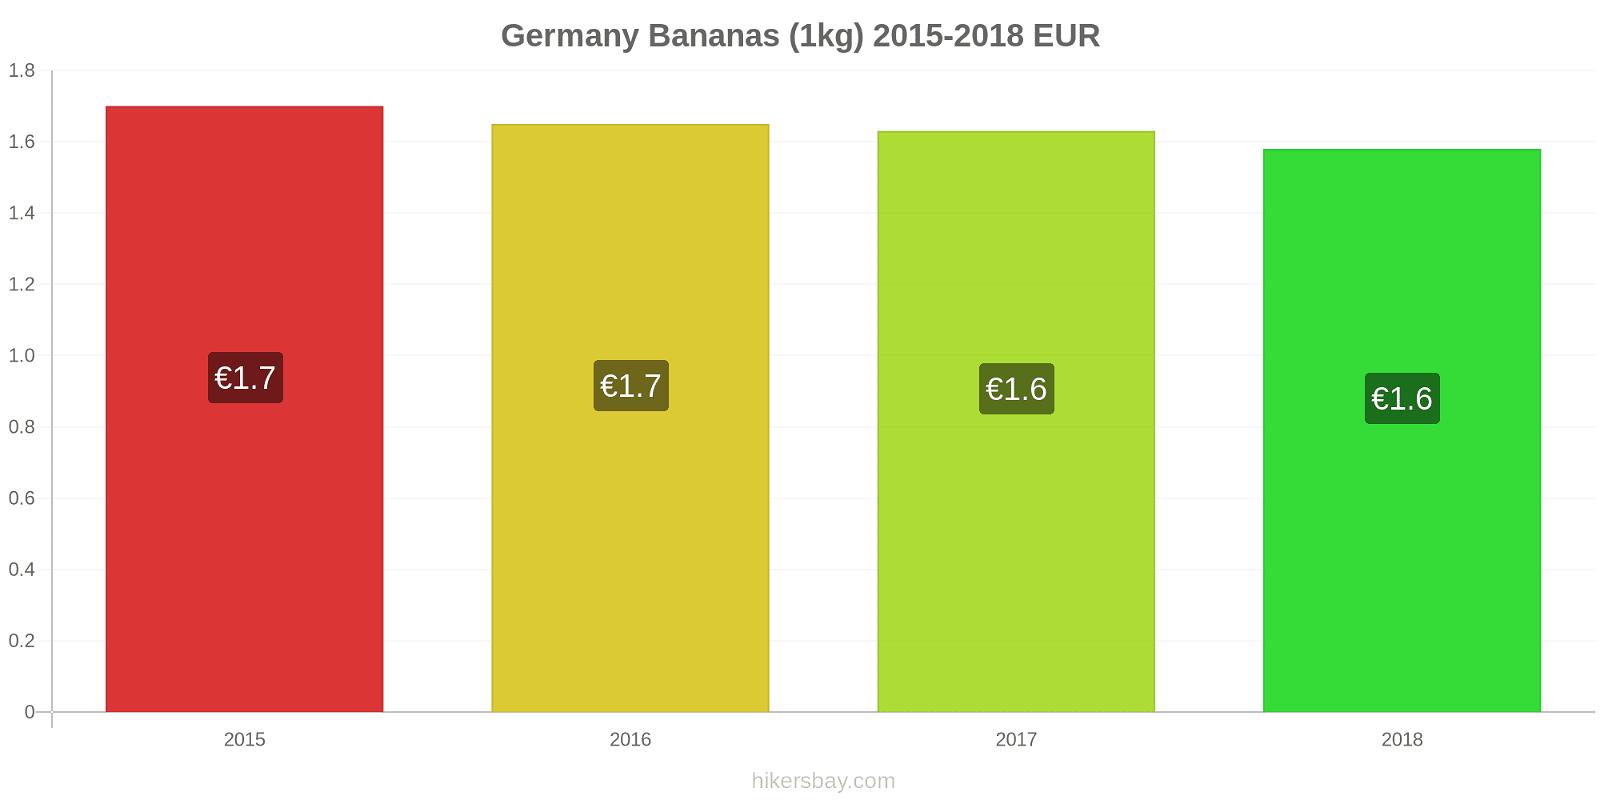 Germany price changes Bananas (1kg) hikersbay.com